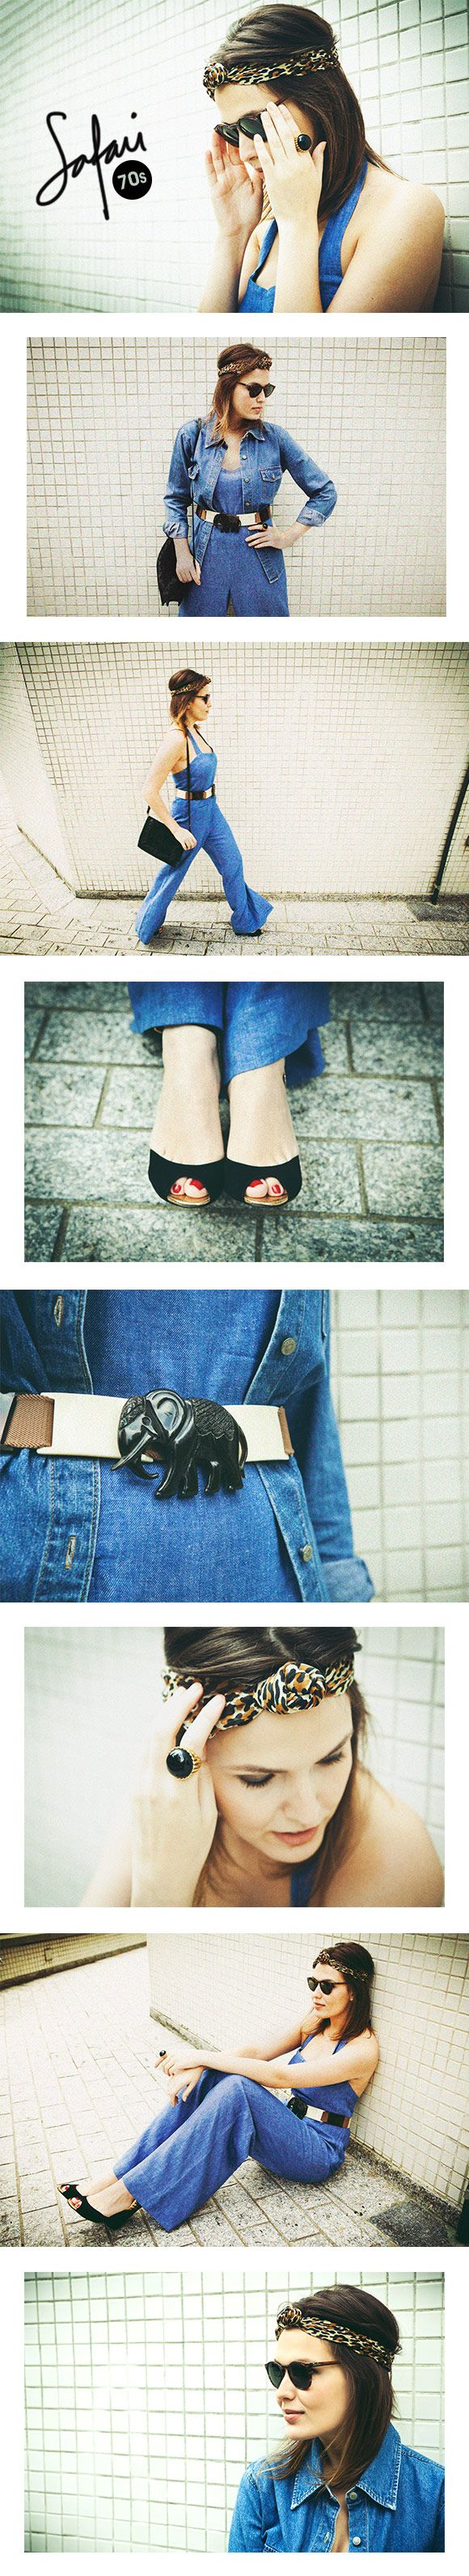 Achados da Bia | A minha moda | Safari 70s